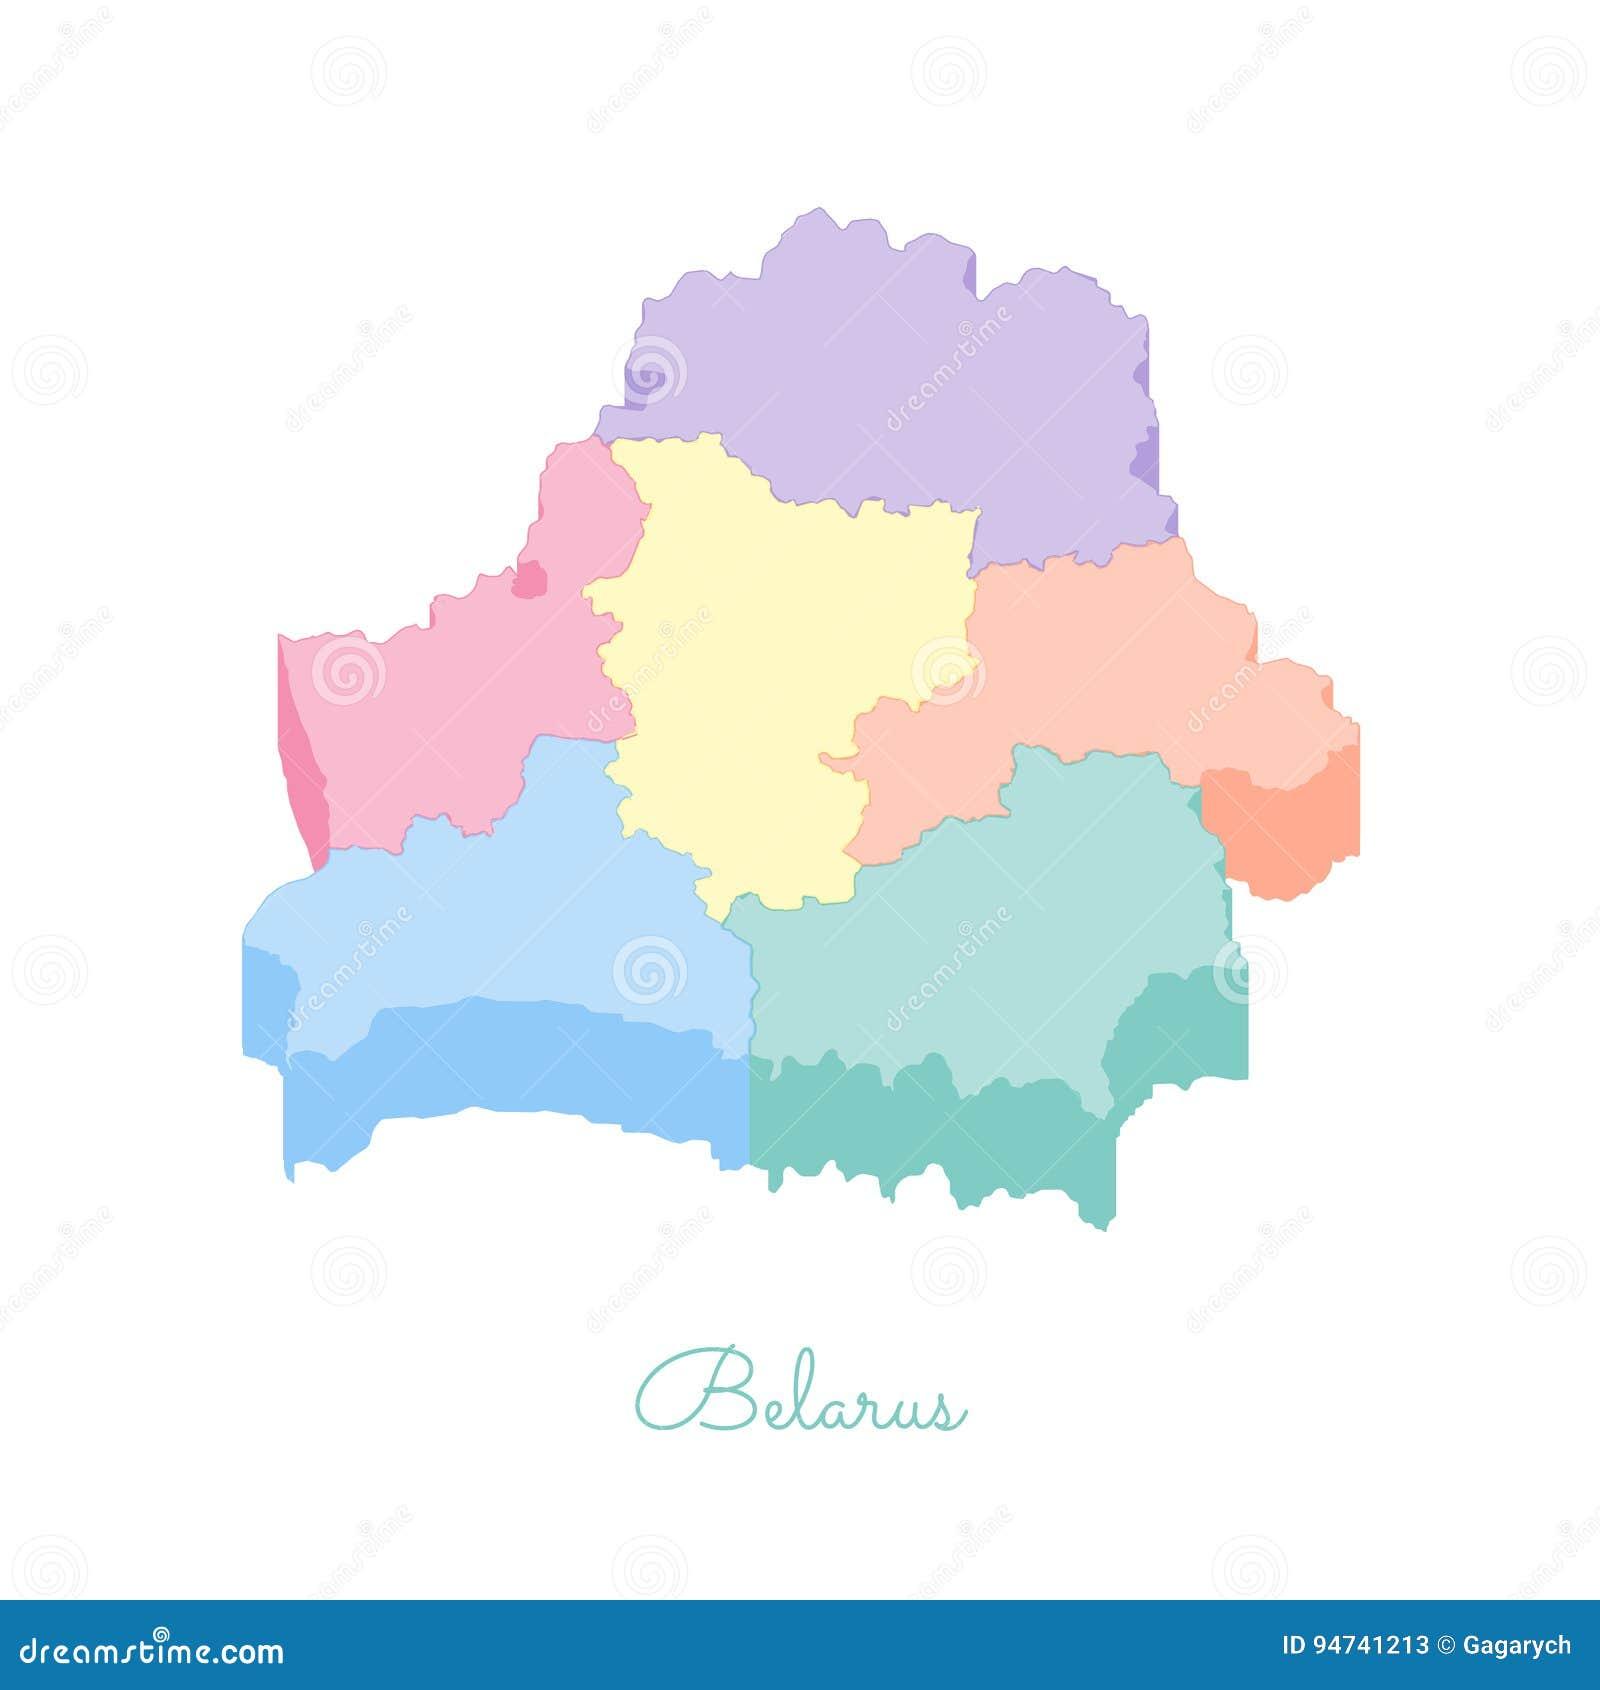 карта беларуси с изображением символа области фото это мешает